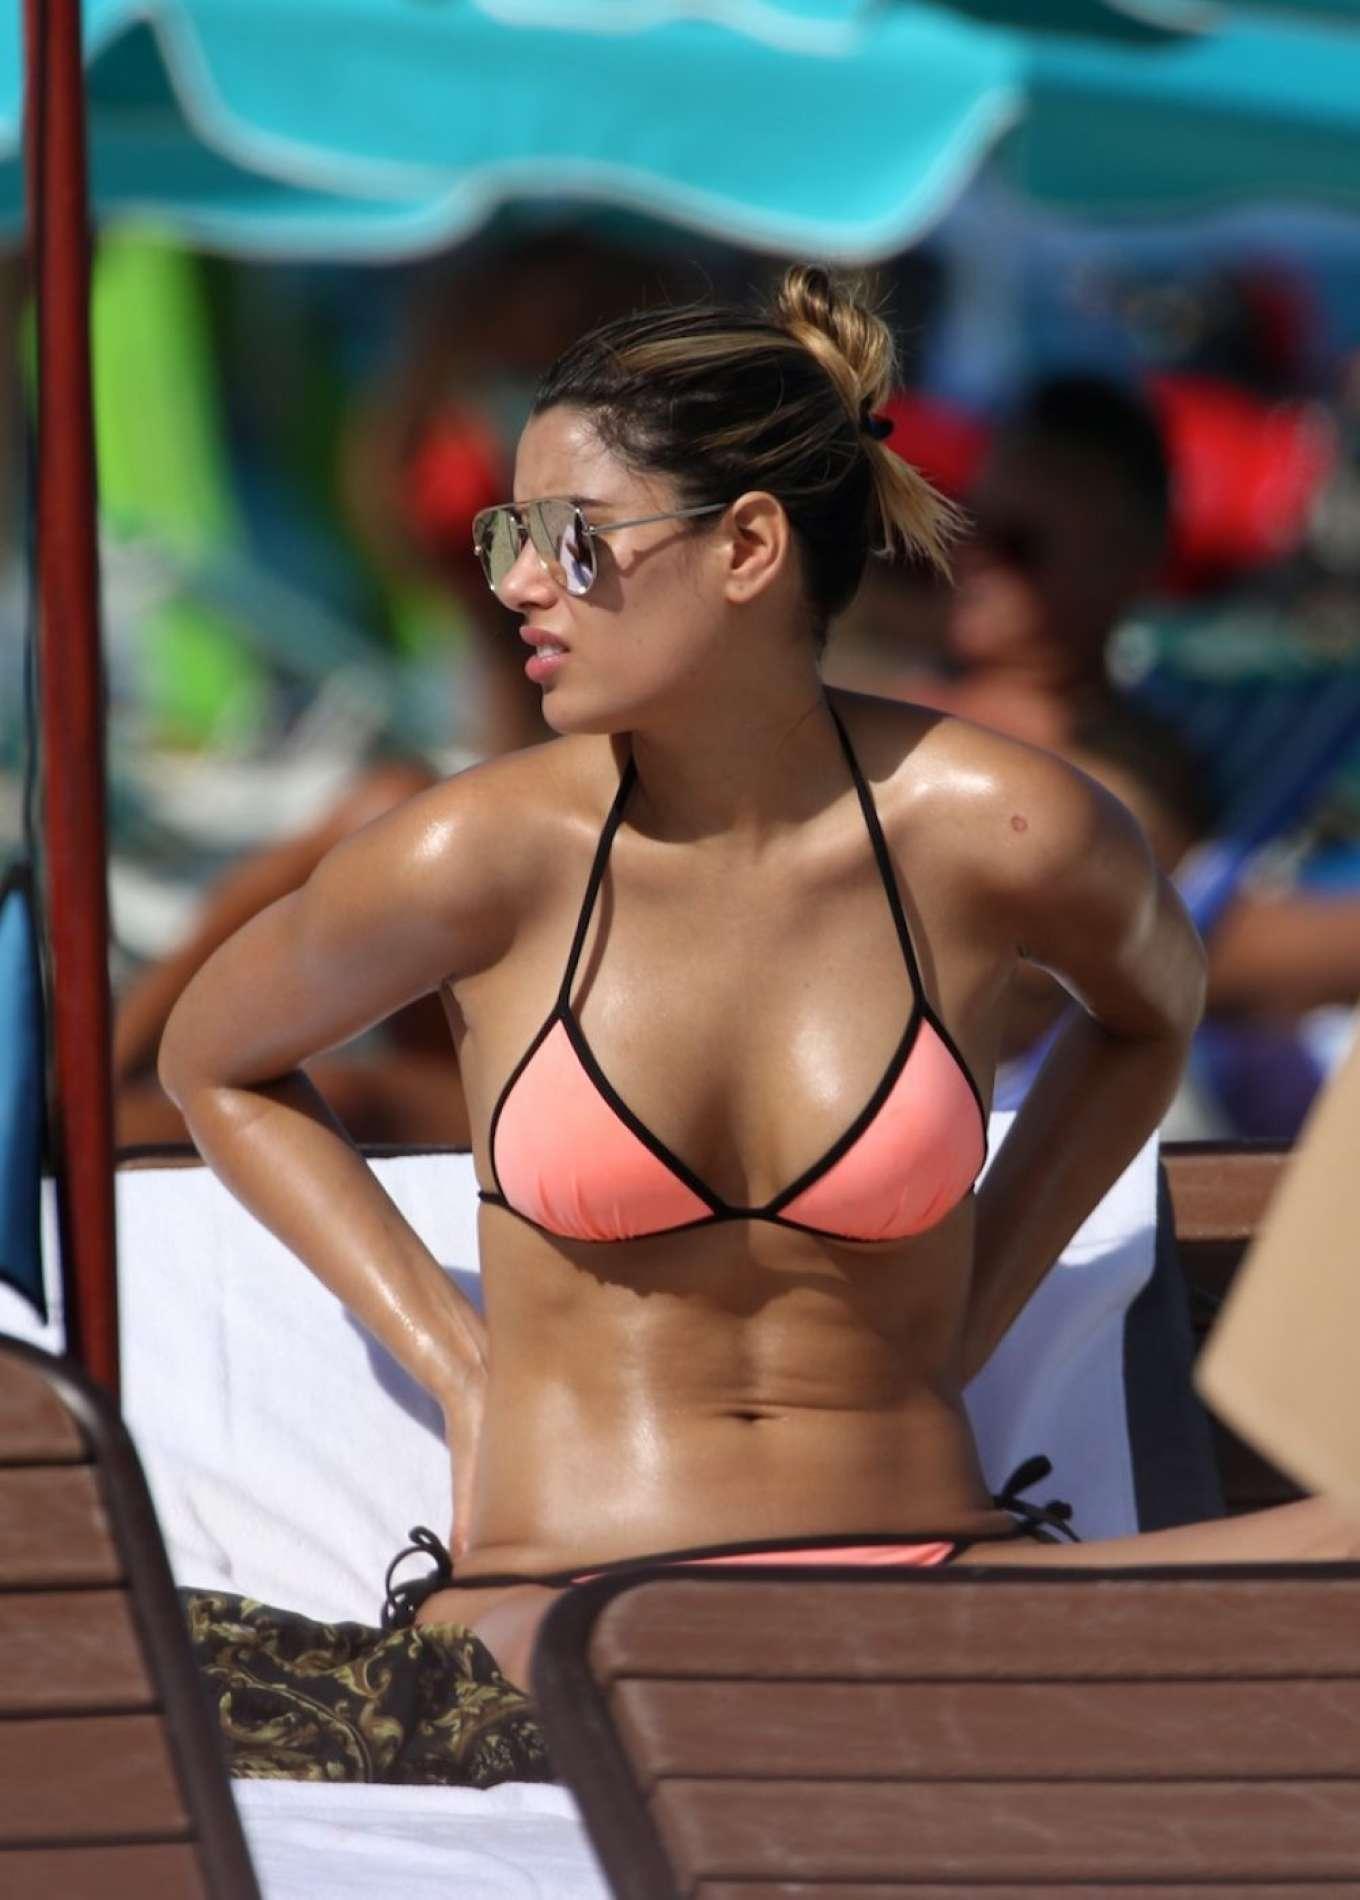 Bikini Ariadna Gutierrez naked (19 photo), Topless, Paparazzi, Twitter, braless 2006